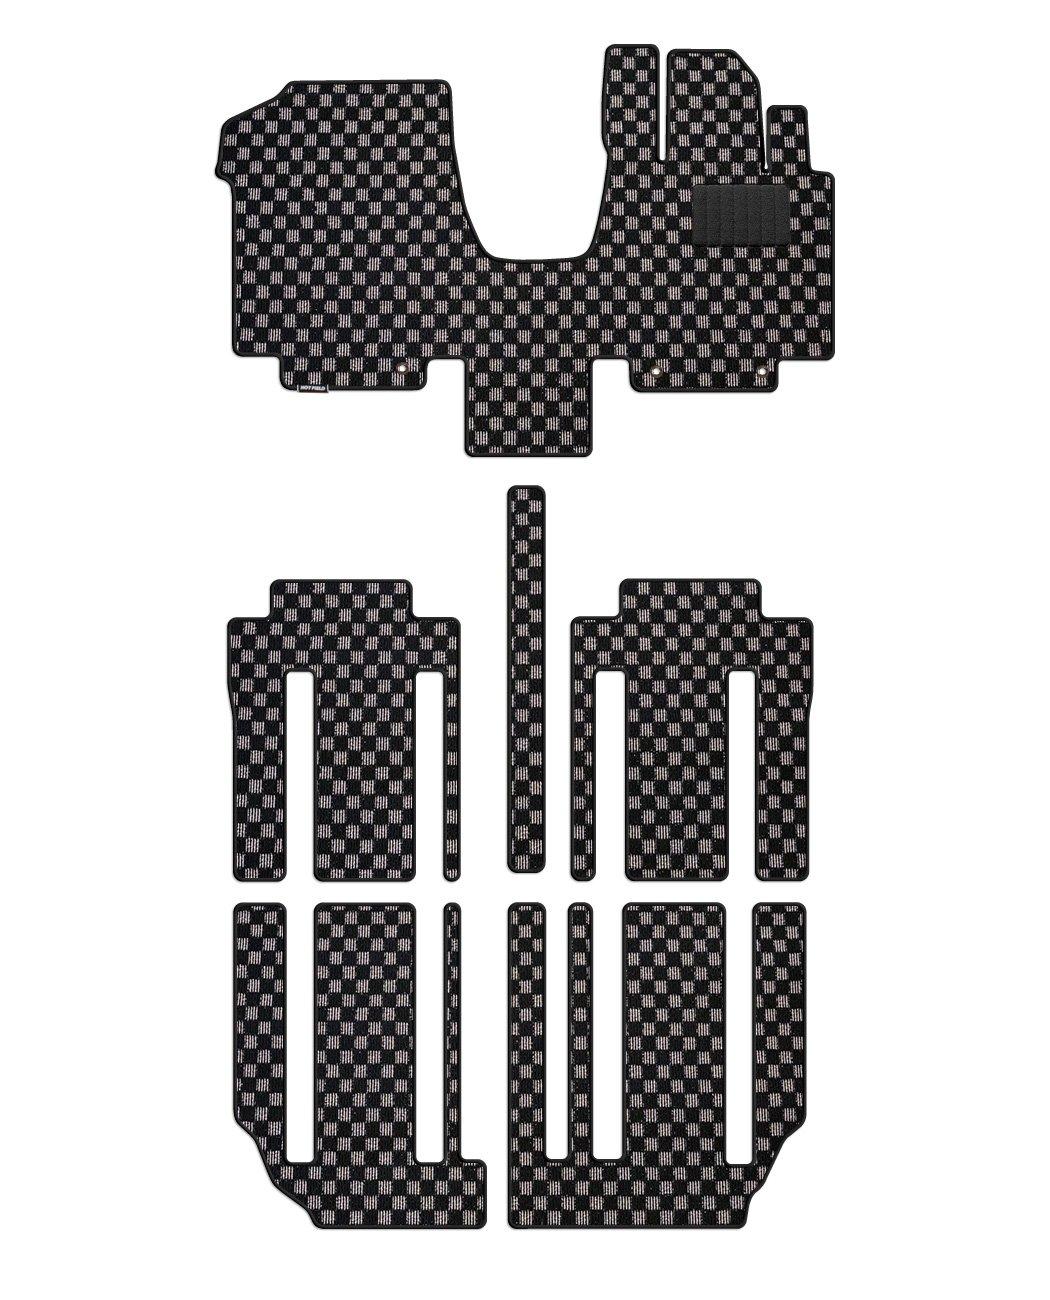 Hotfield 日産 セレナ C27系 (ガソリン車) フロアマット チェックグレー 【B:フロント一体:パーツ一体/ロングスライド(標準仕様)】 B01LGK18S0 【B:フロント一体:パーツ一体 / ロングスライド(標準仕様)】|チェックグレー チェックグレー 【B:フロント一体:パーツ一体 / ロングスライド(標準仕様)】